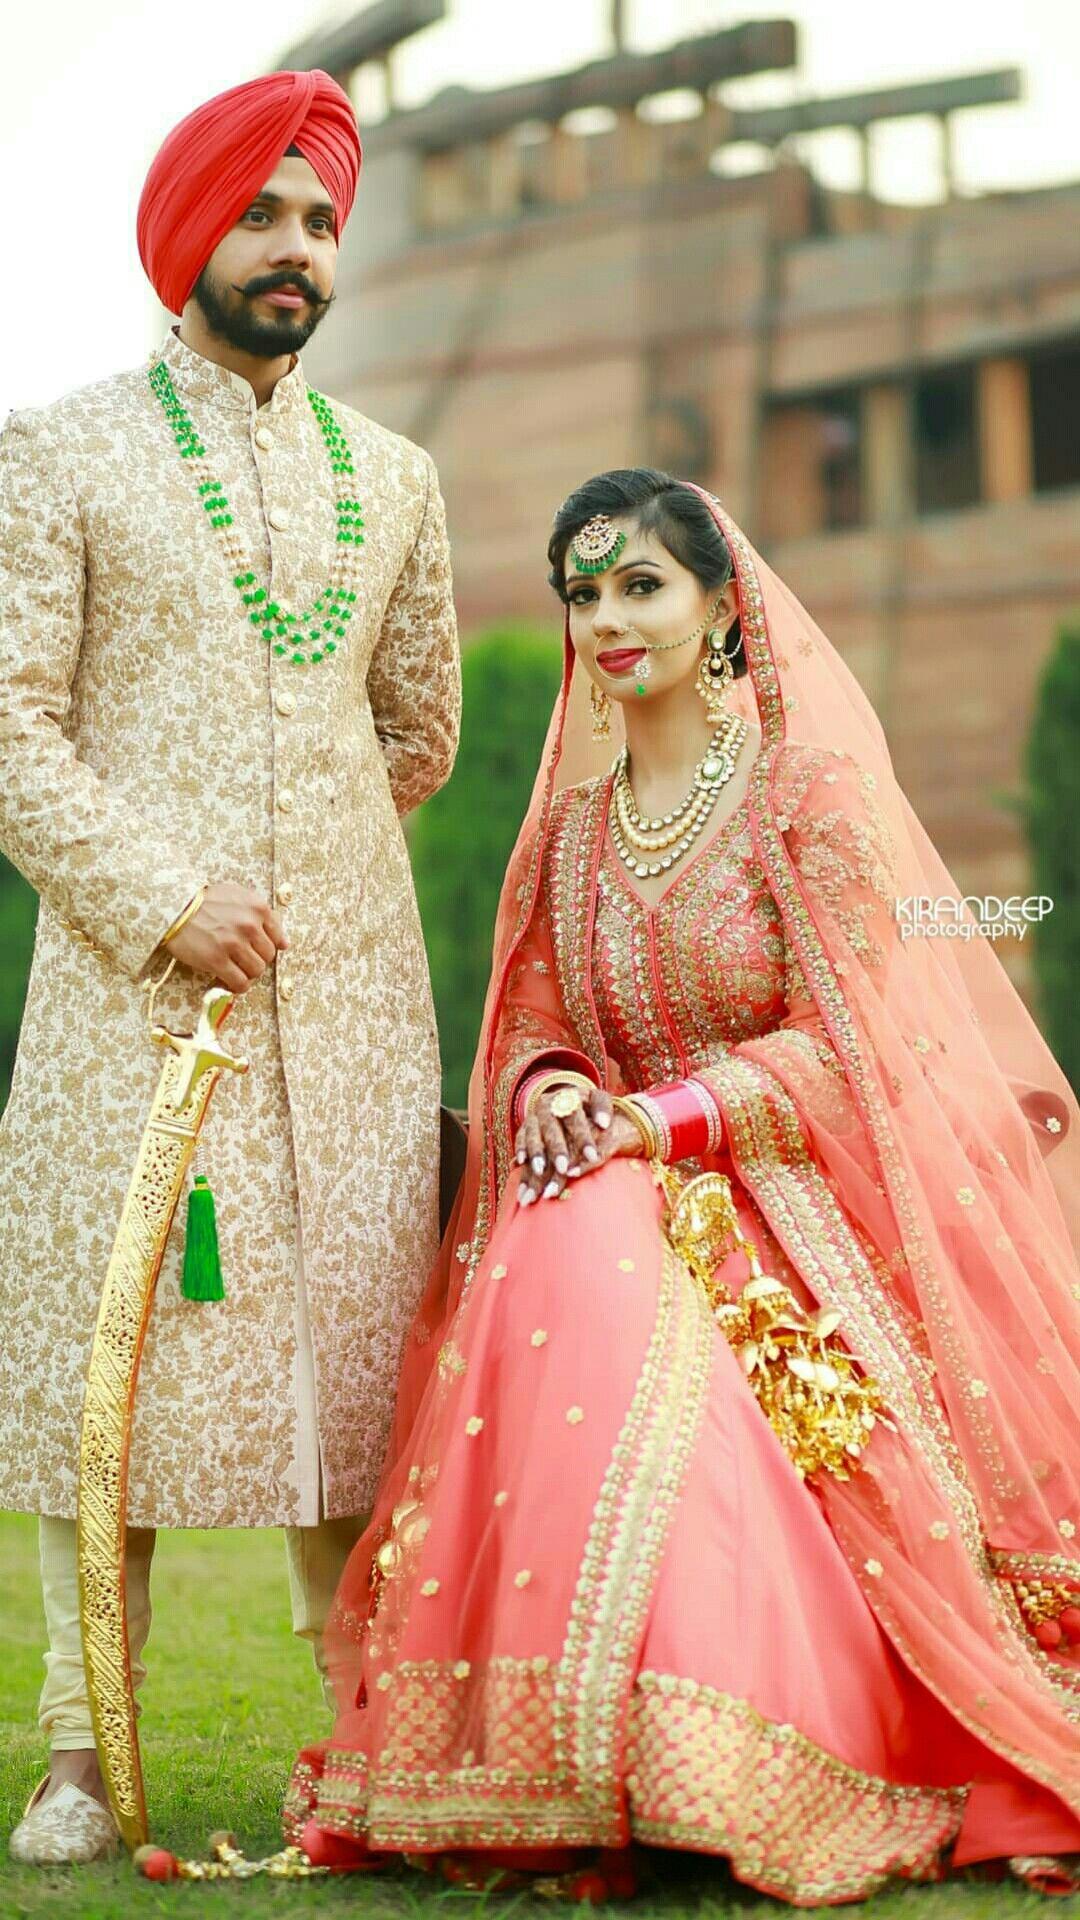 Follow me maliha tabassum for more indian wedding couple